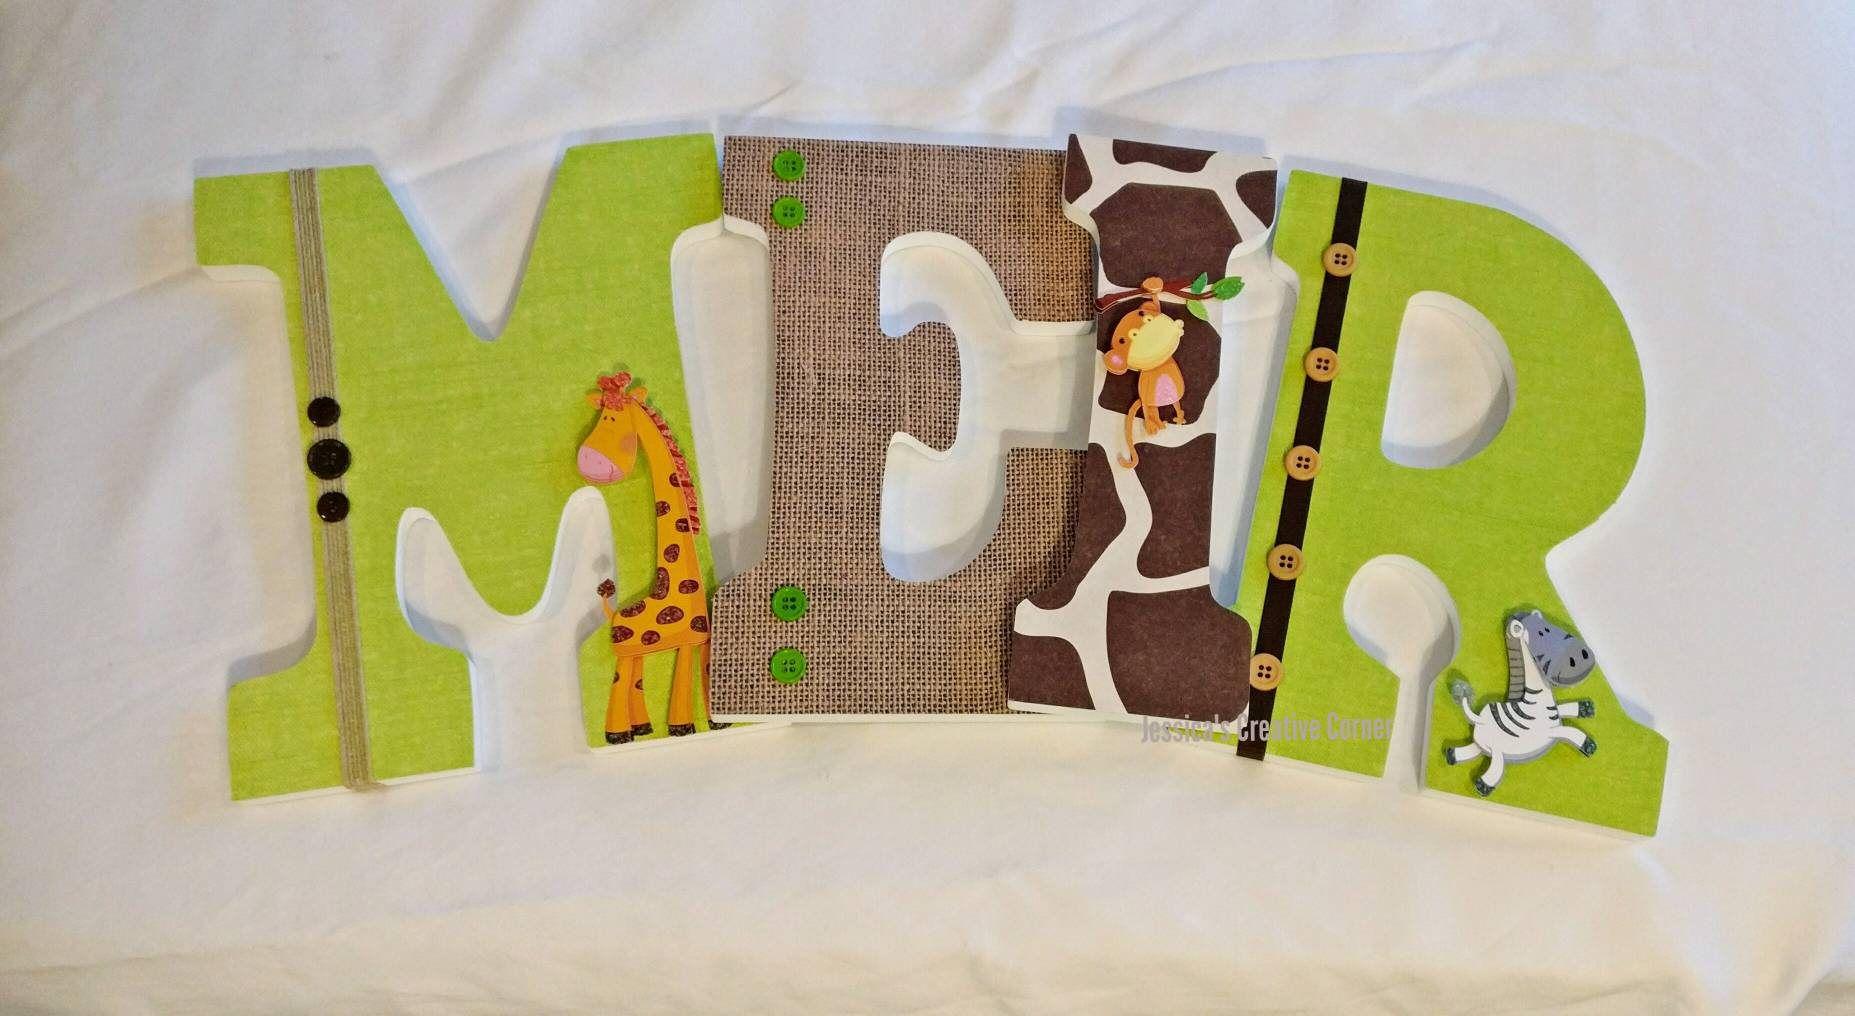 Jungle nursery wooden letters safari nursery decor jungle